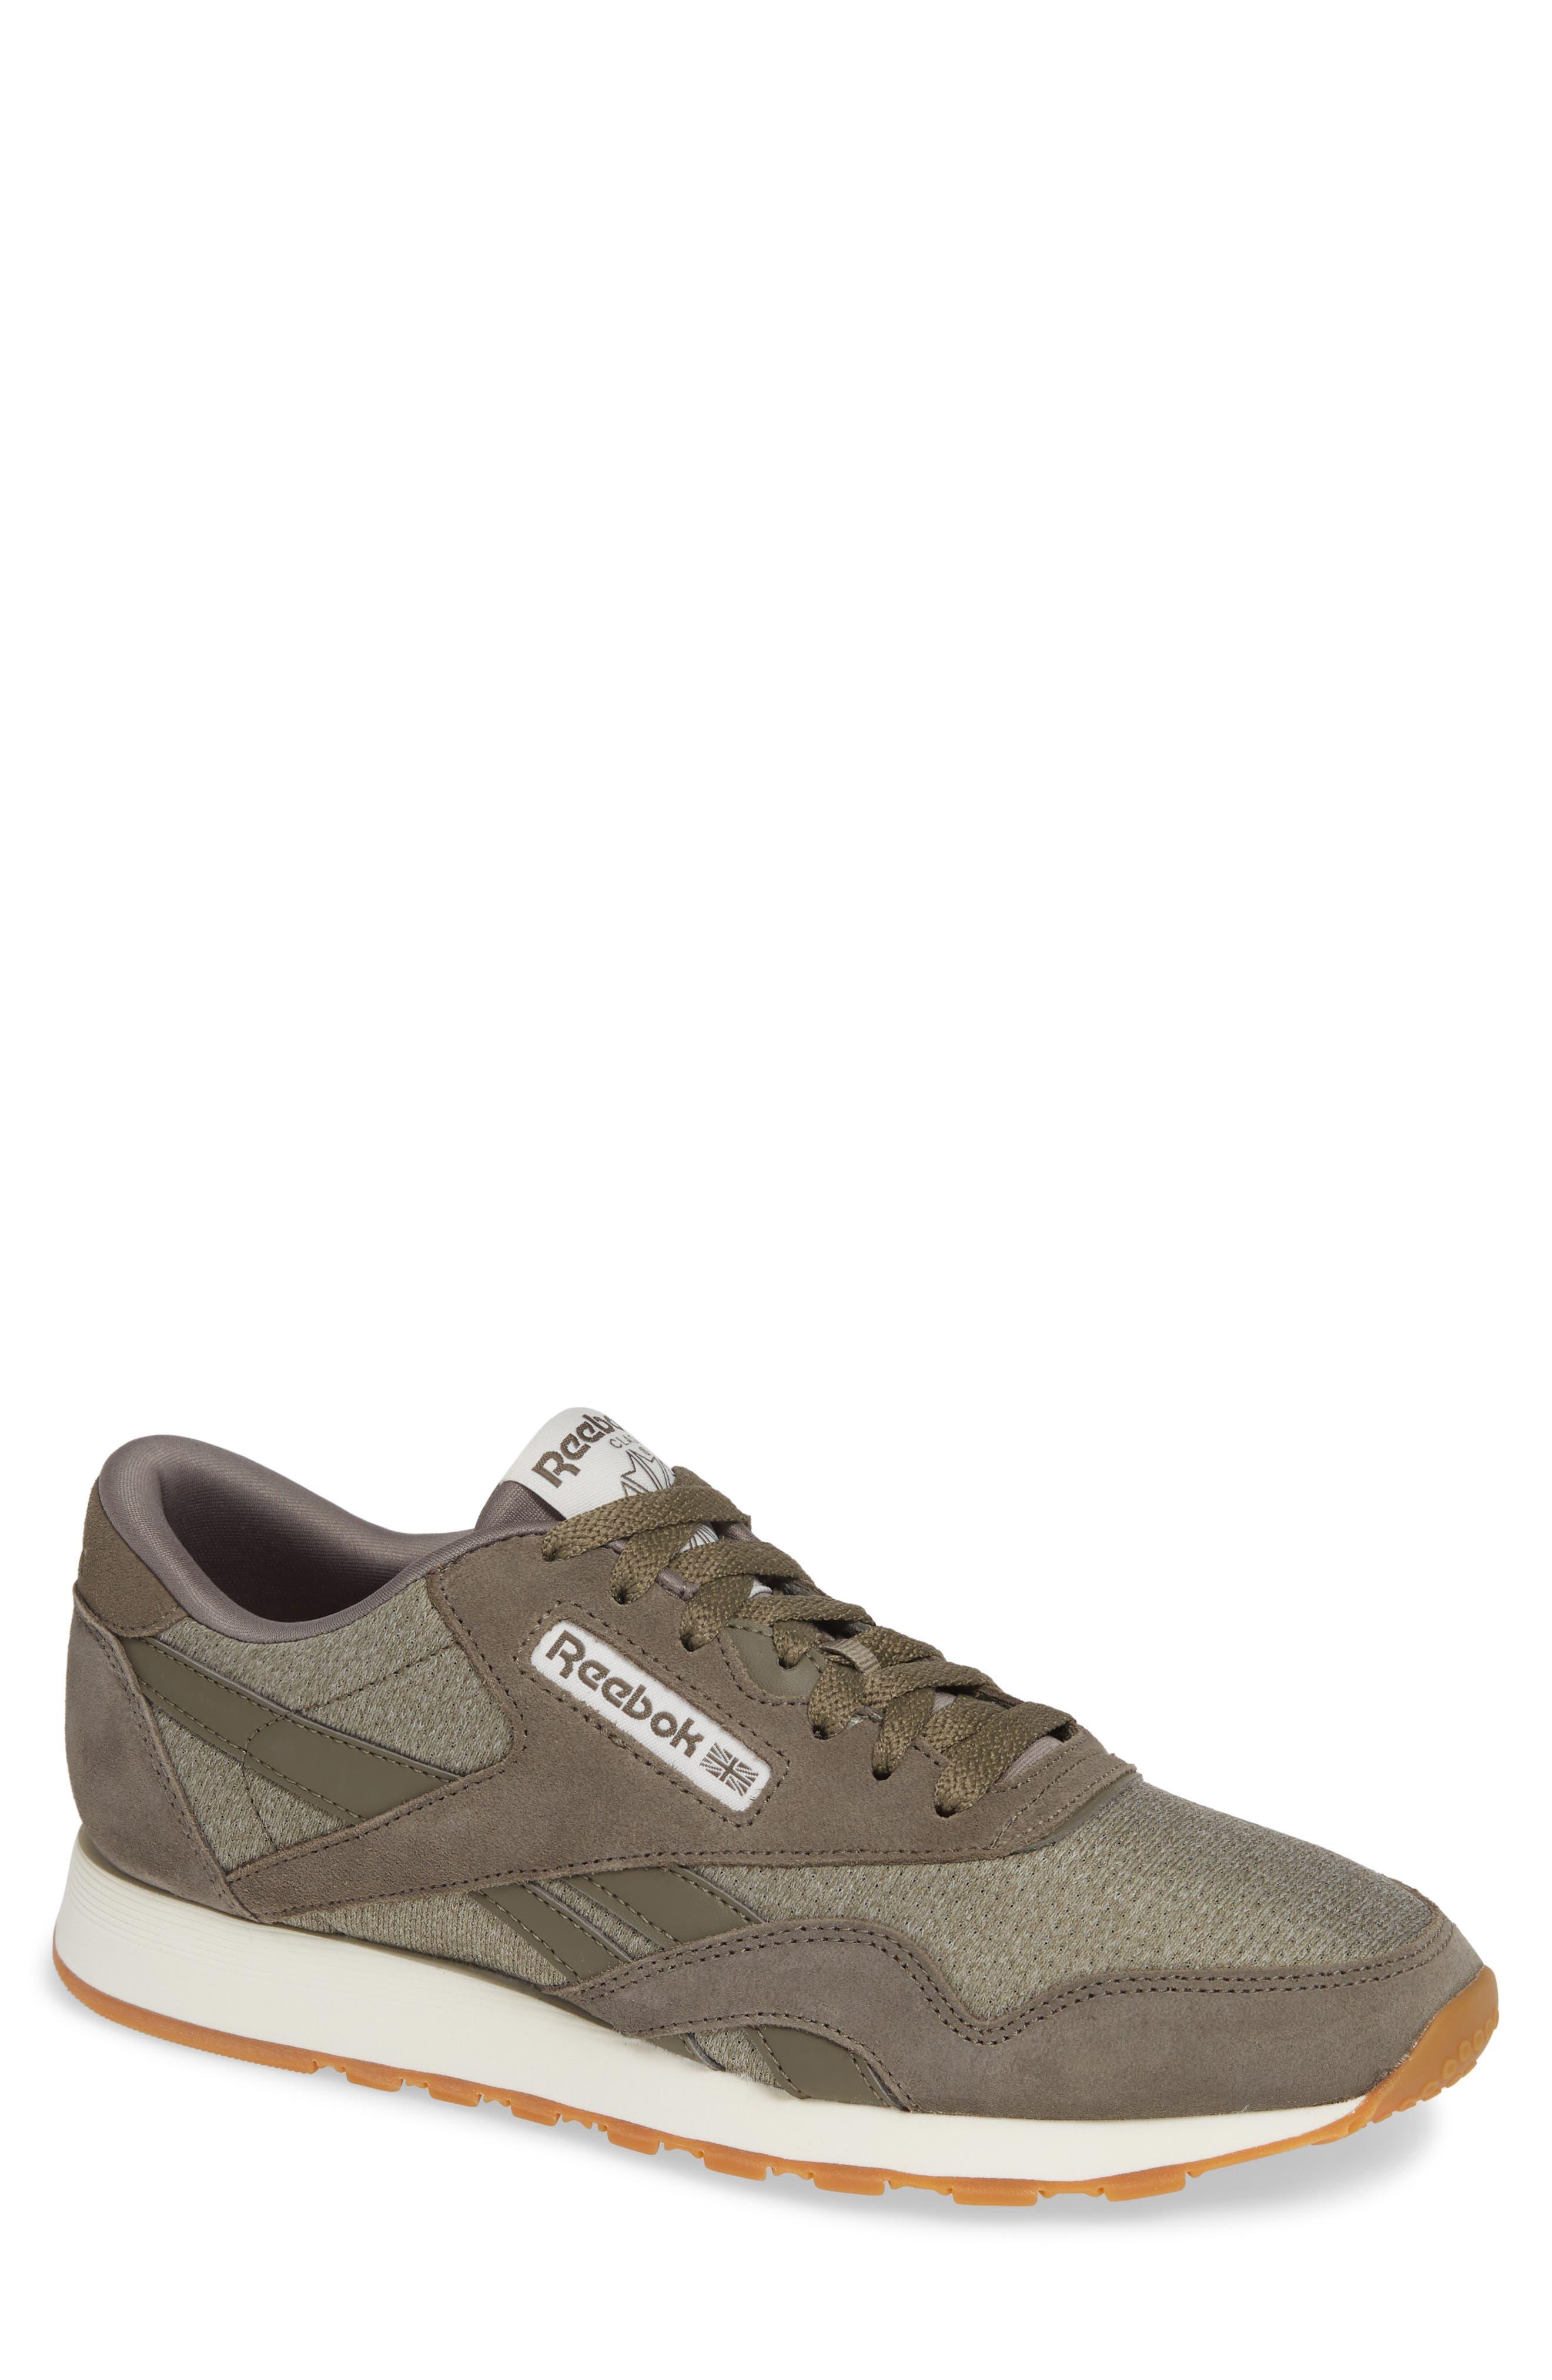 Classic Leather Nylon SG Sneaker,                         Main,                         color, TERRAIN GREY/ CHALK